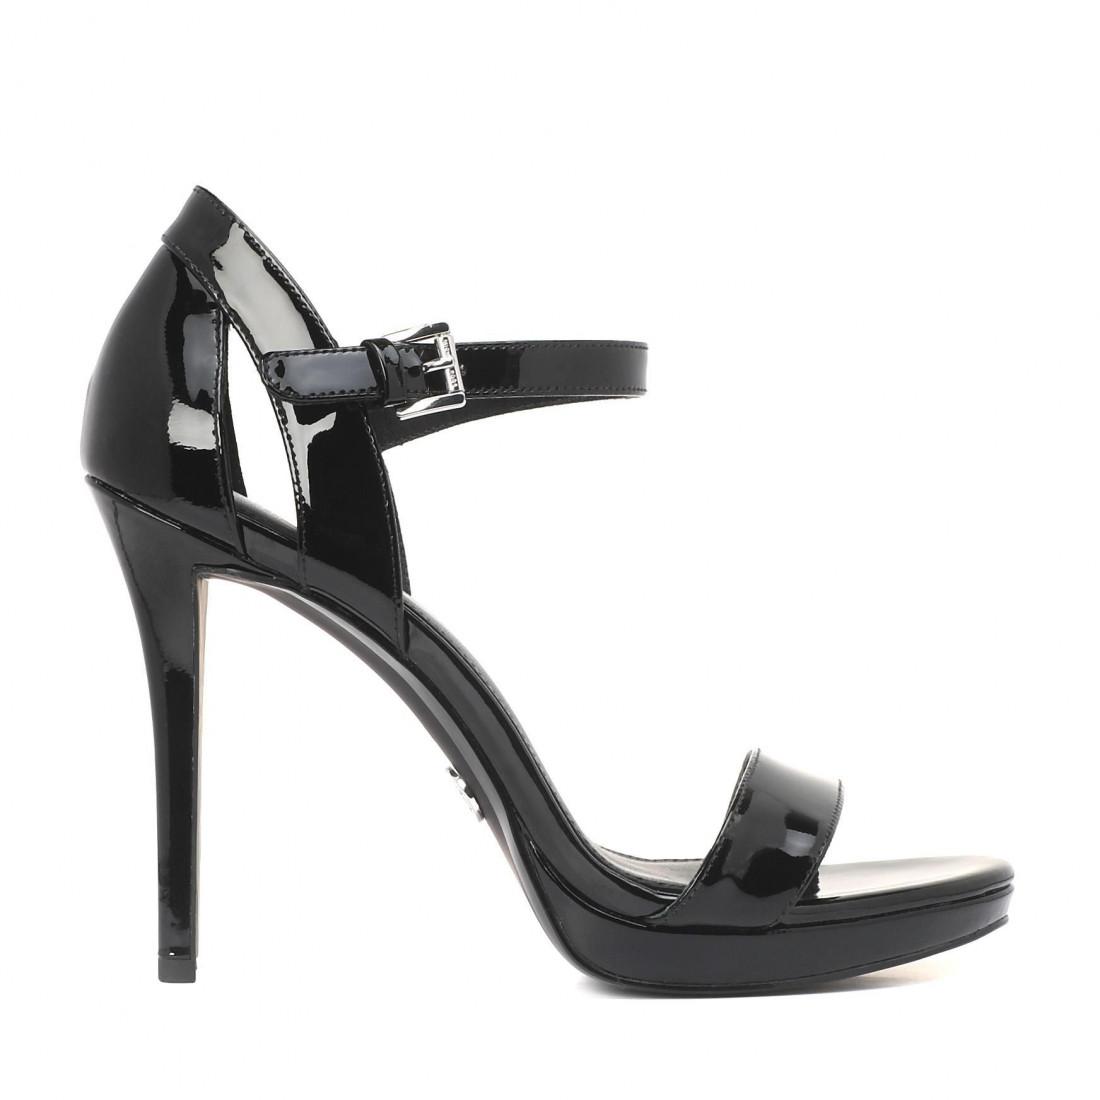 sandals woman michael kors 40s8tmhs1a 001 3455